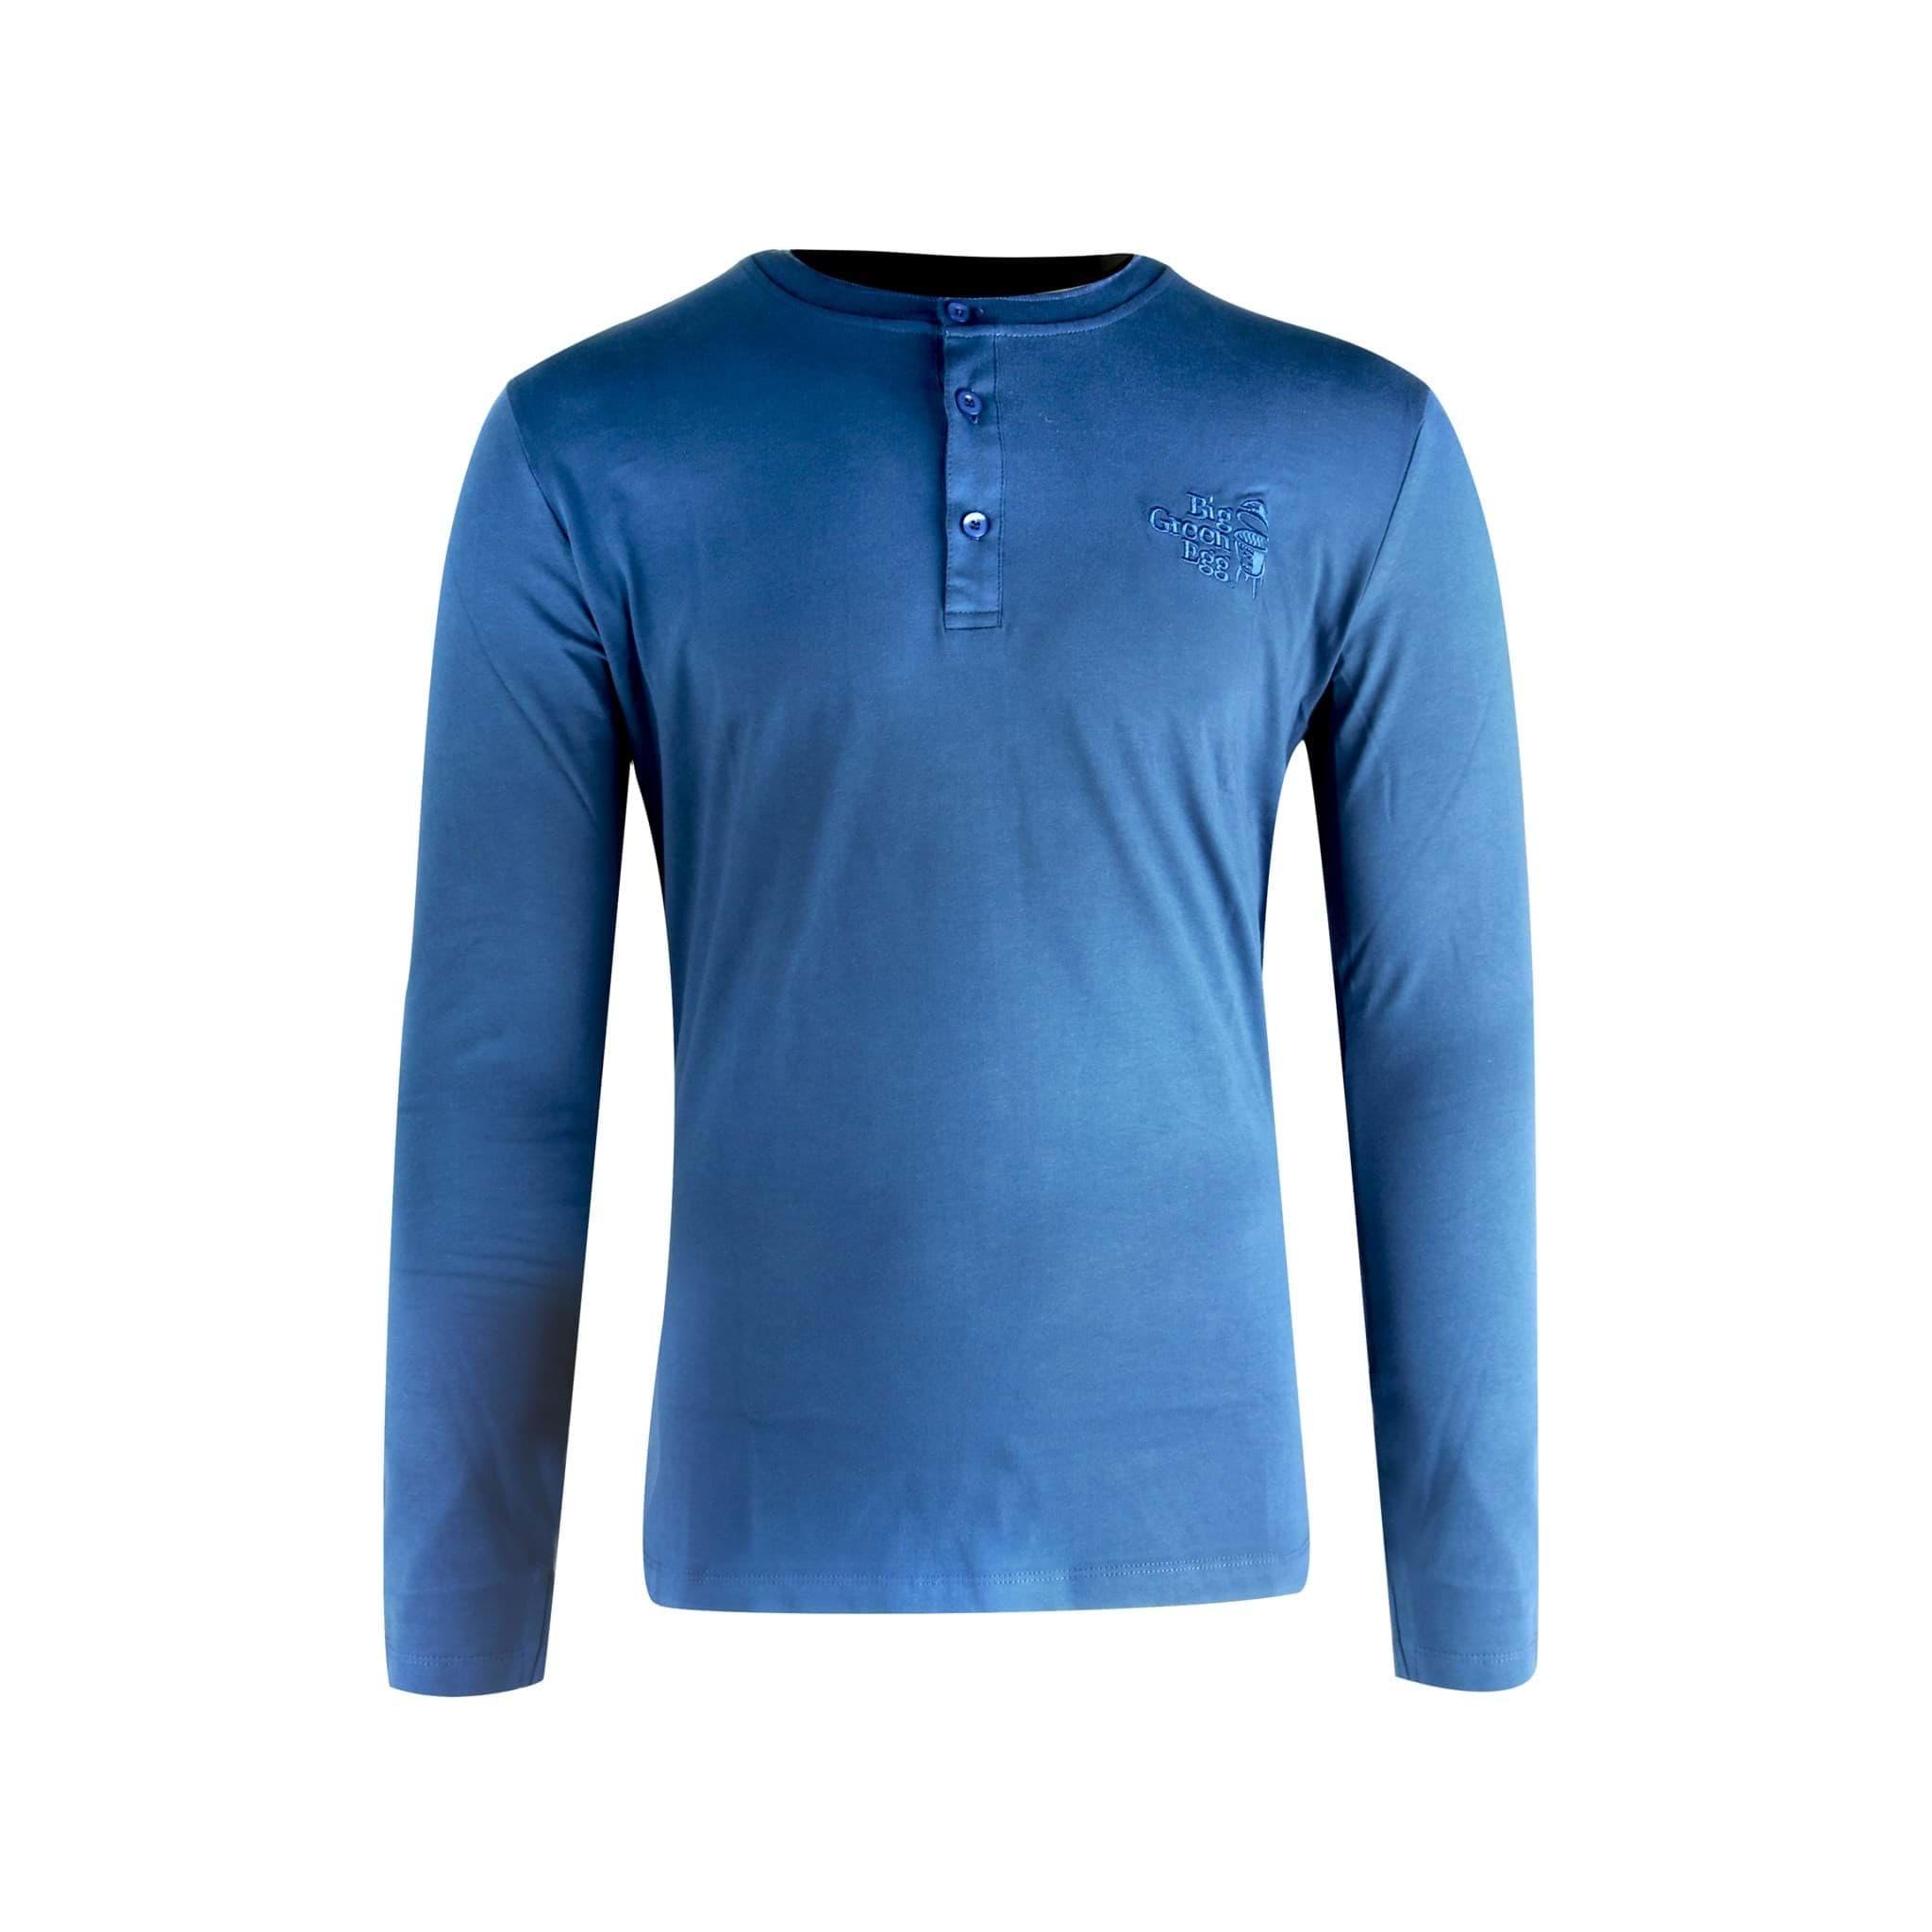 LONG SHIRT - BLUE   Badé - Outdoor Living on Bade Outdoor Living id=92033